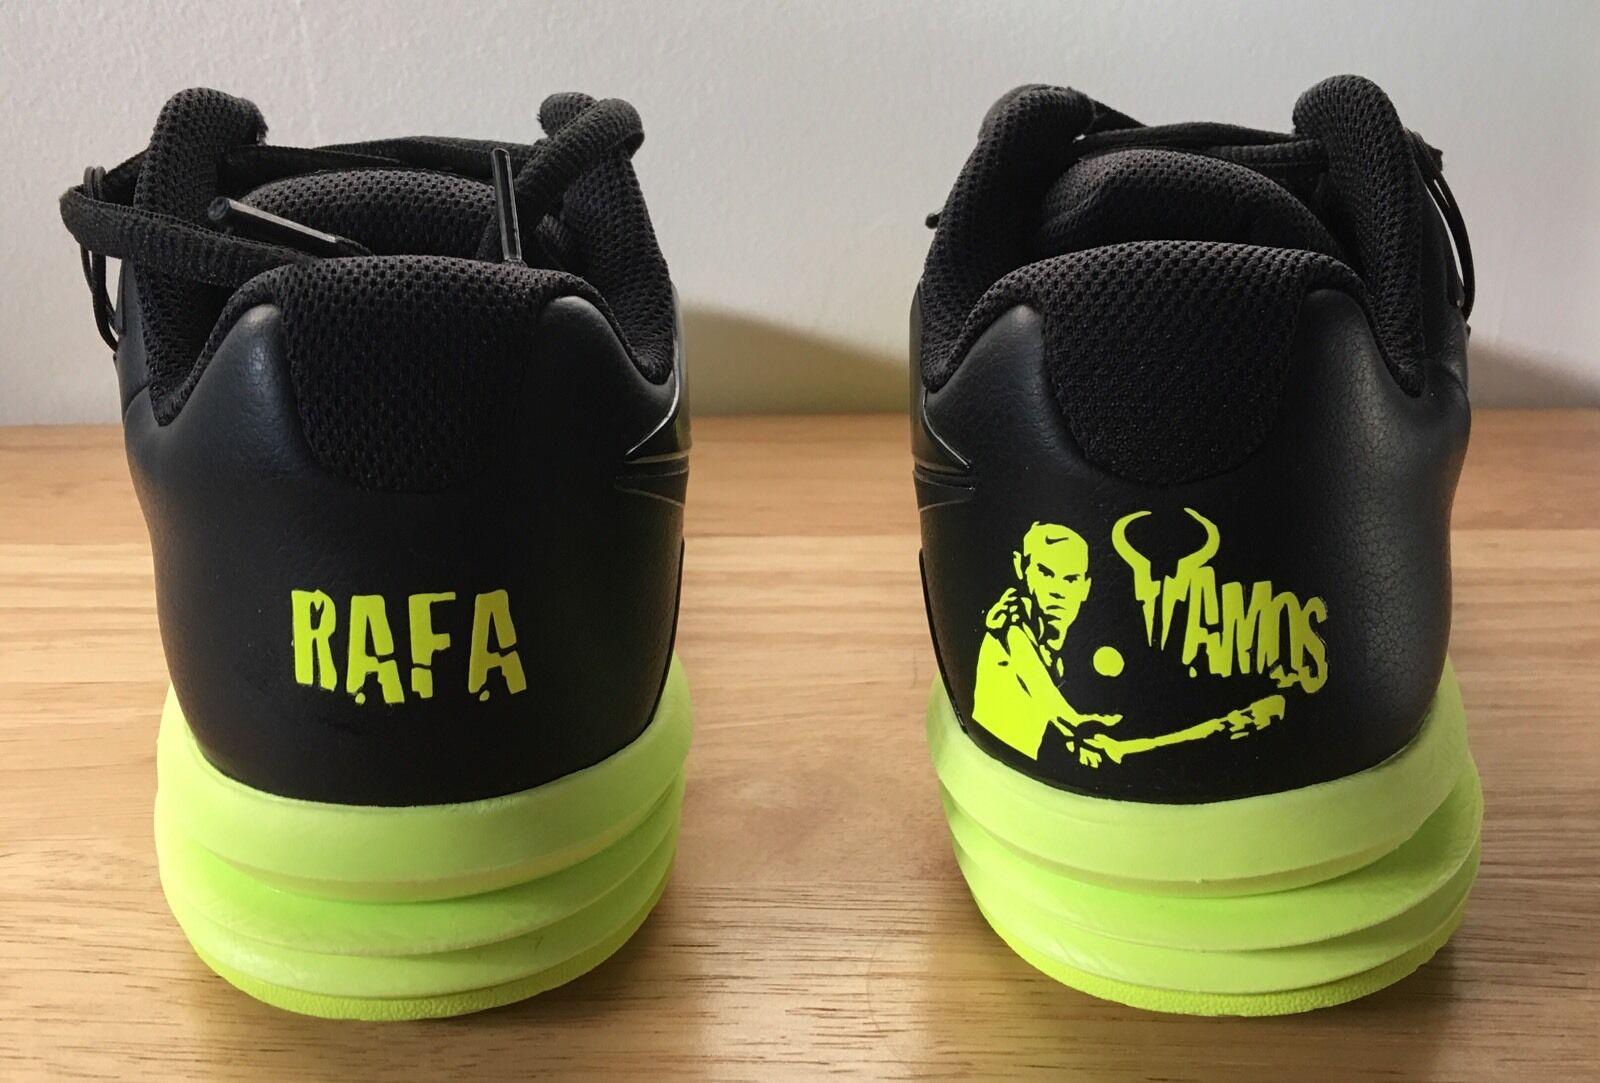 nike lunarballistec Nadal tennis shoes with customization option federer (sz8.5)